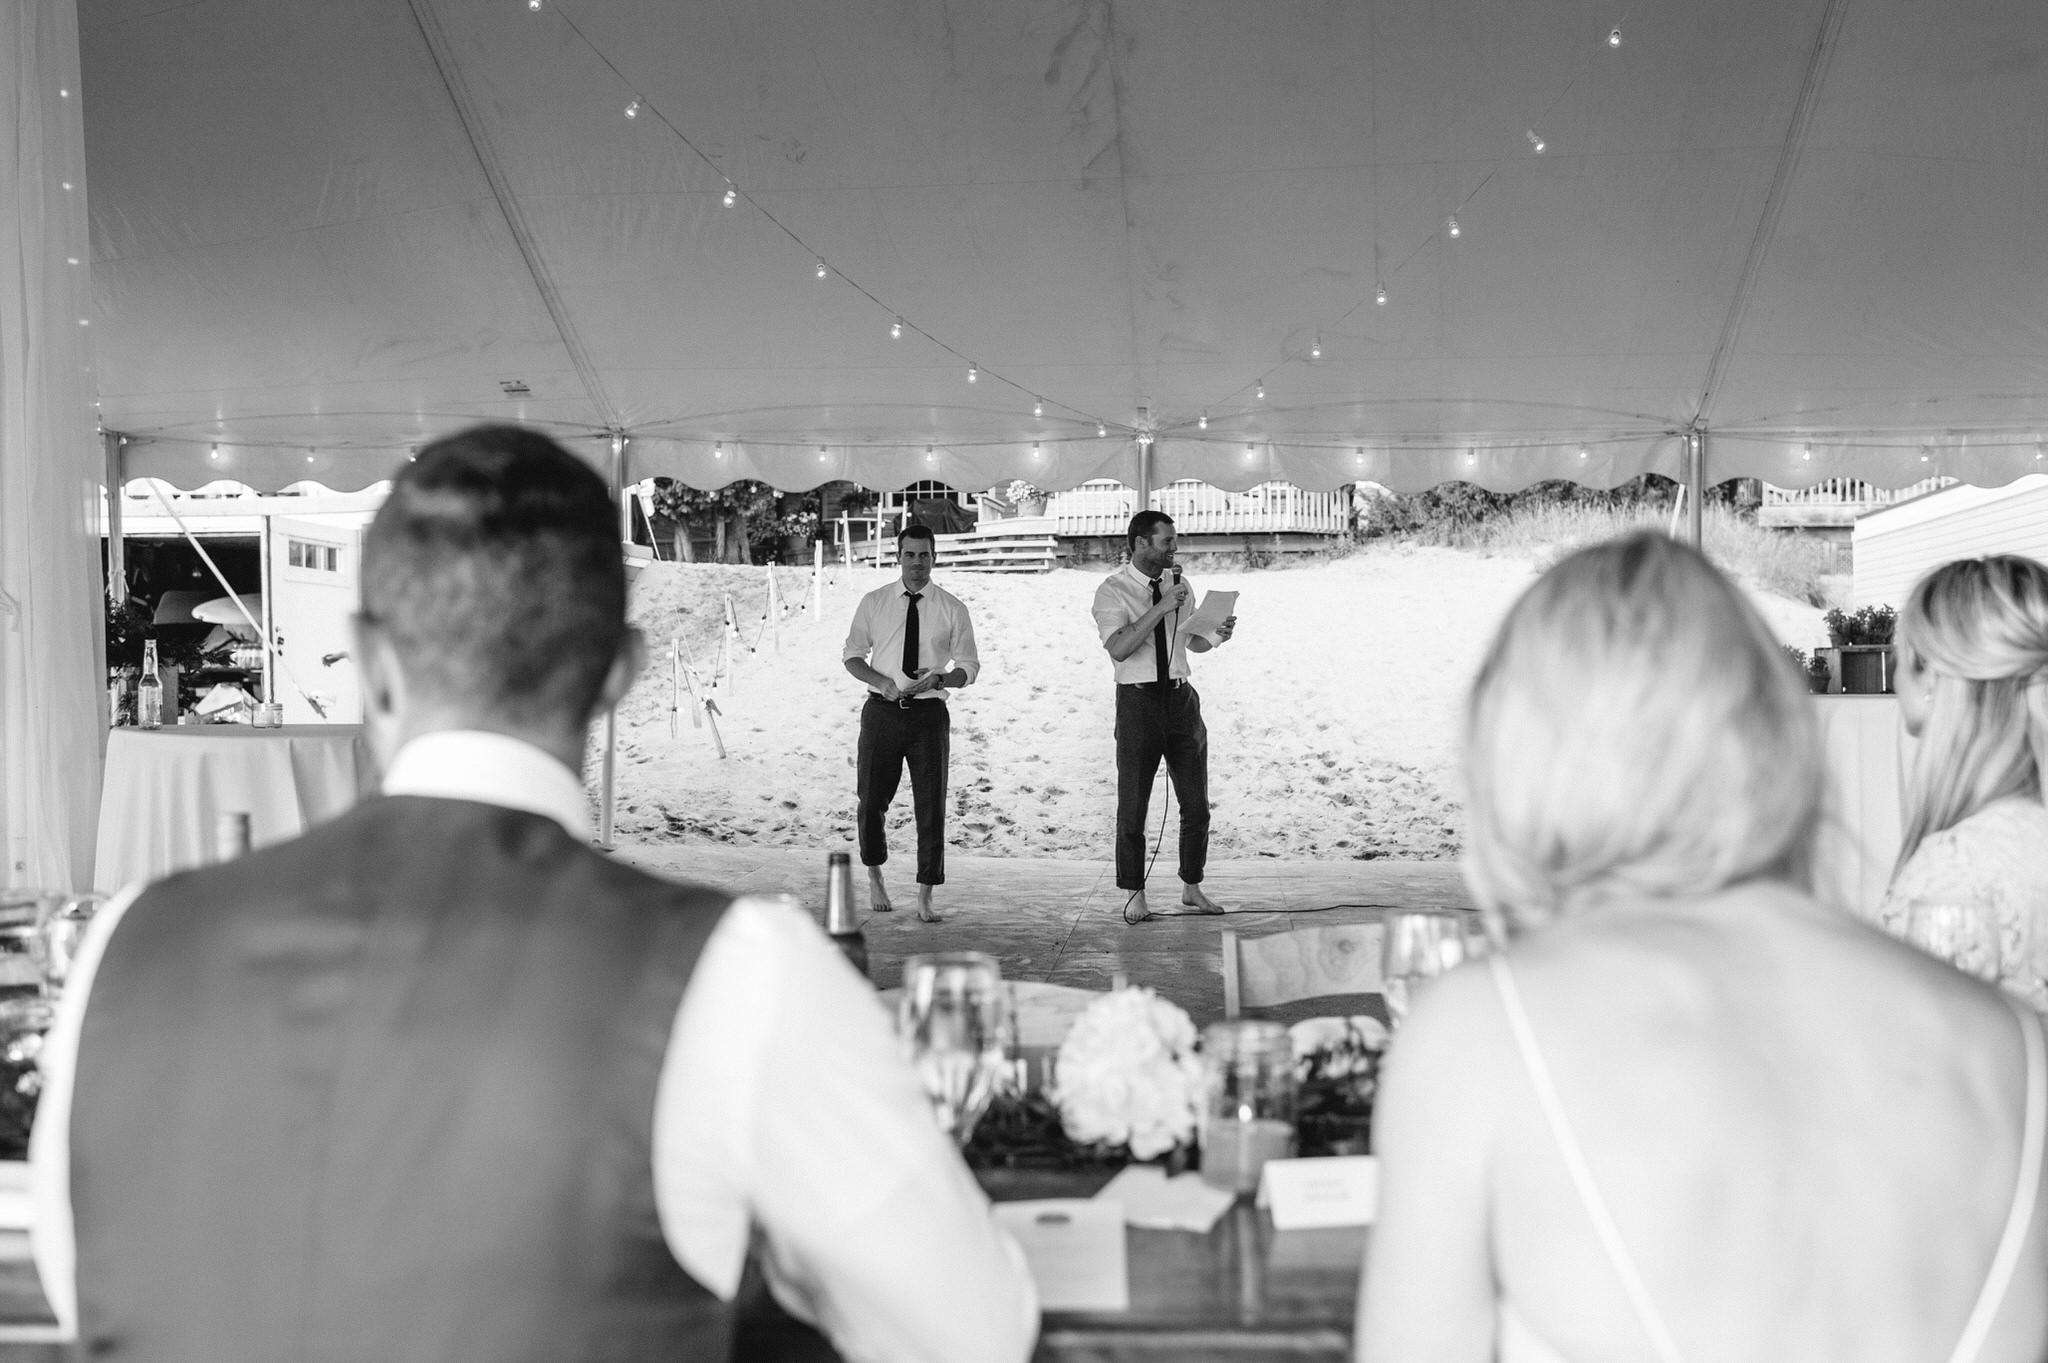 toronto wedding photography scarlet oneill154.JPG